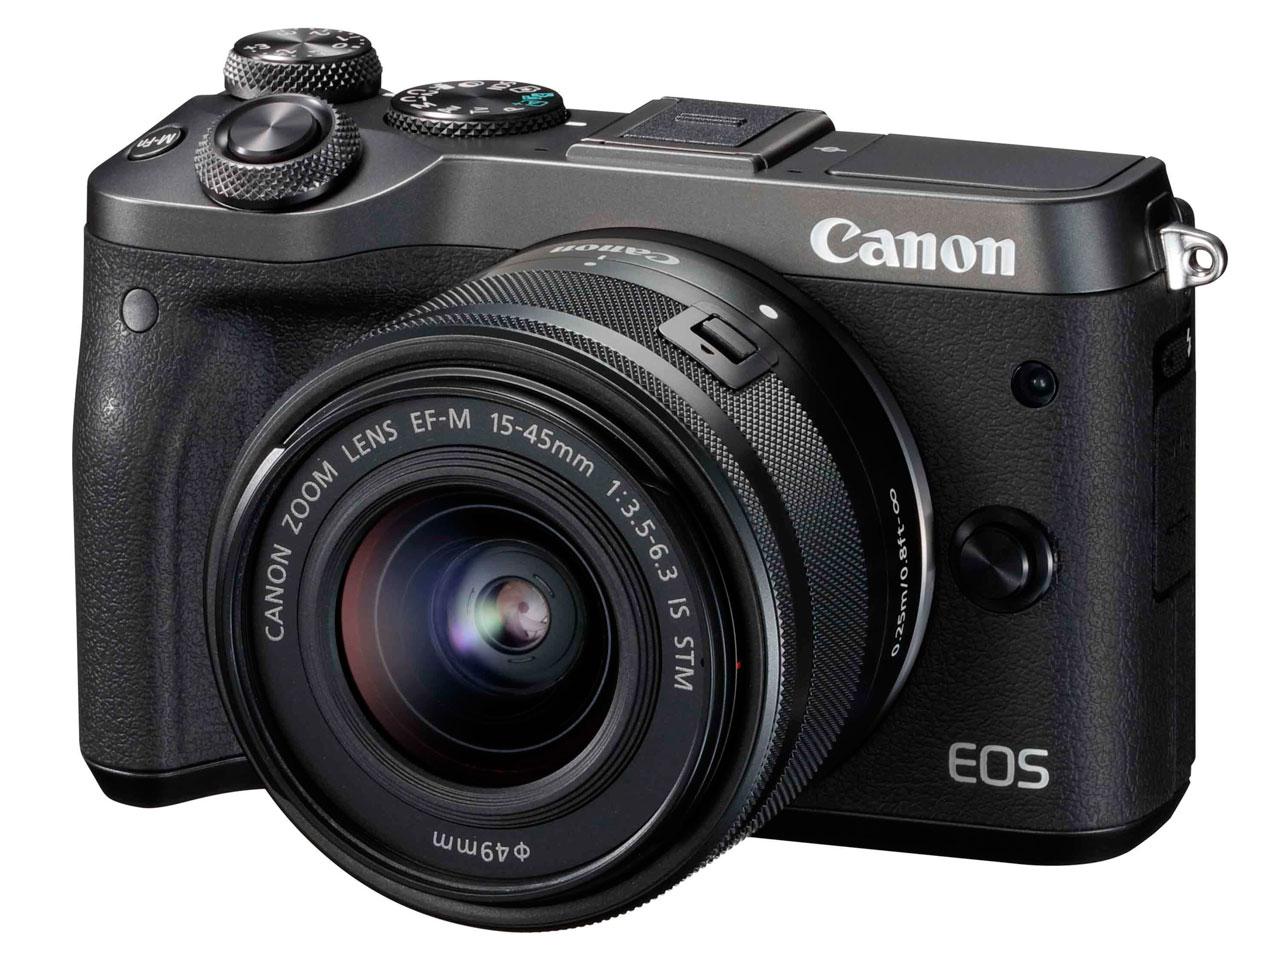 EOS M6 EF-M15-45 IS STM レンズキット の製品画像